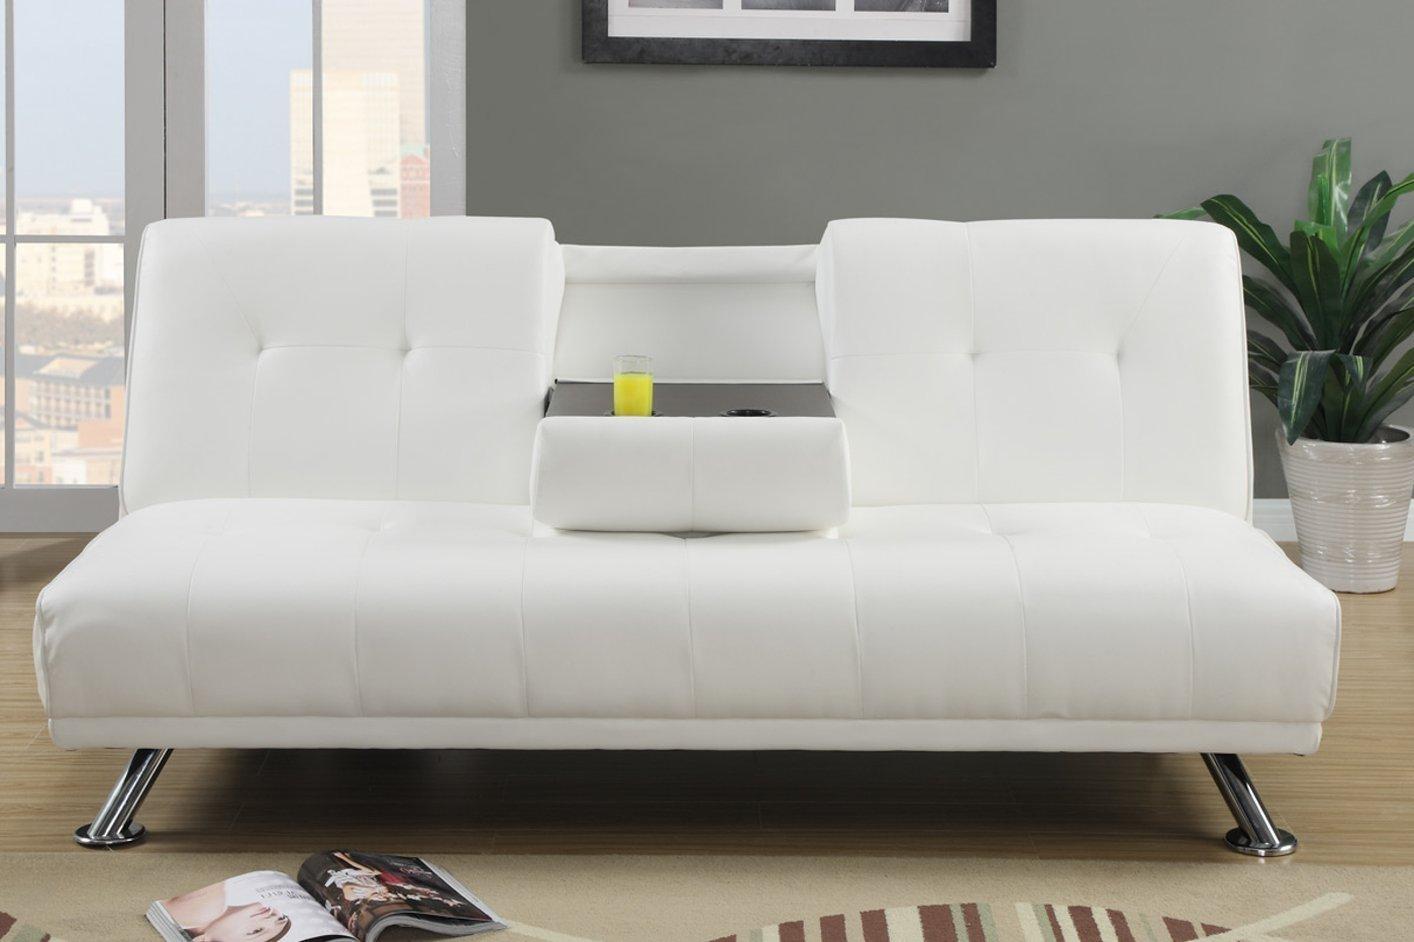 White Leather Futon Sofa Bed | Roselawnlutheran For Faux Leather Futon Sofas (Image 20 of 20)